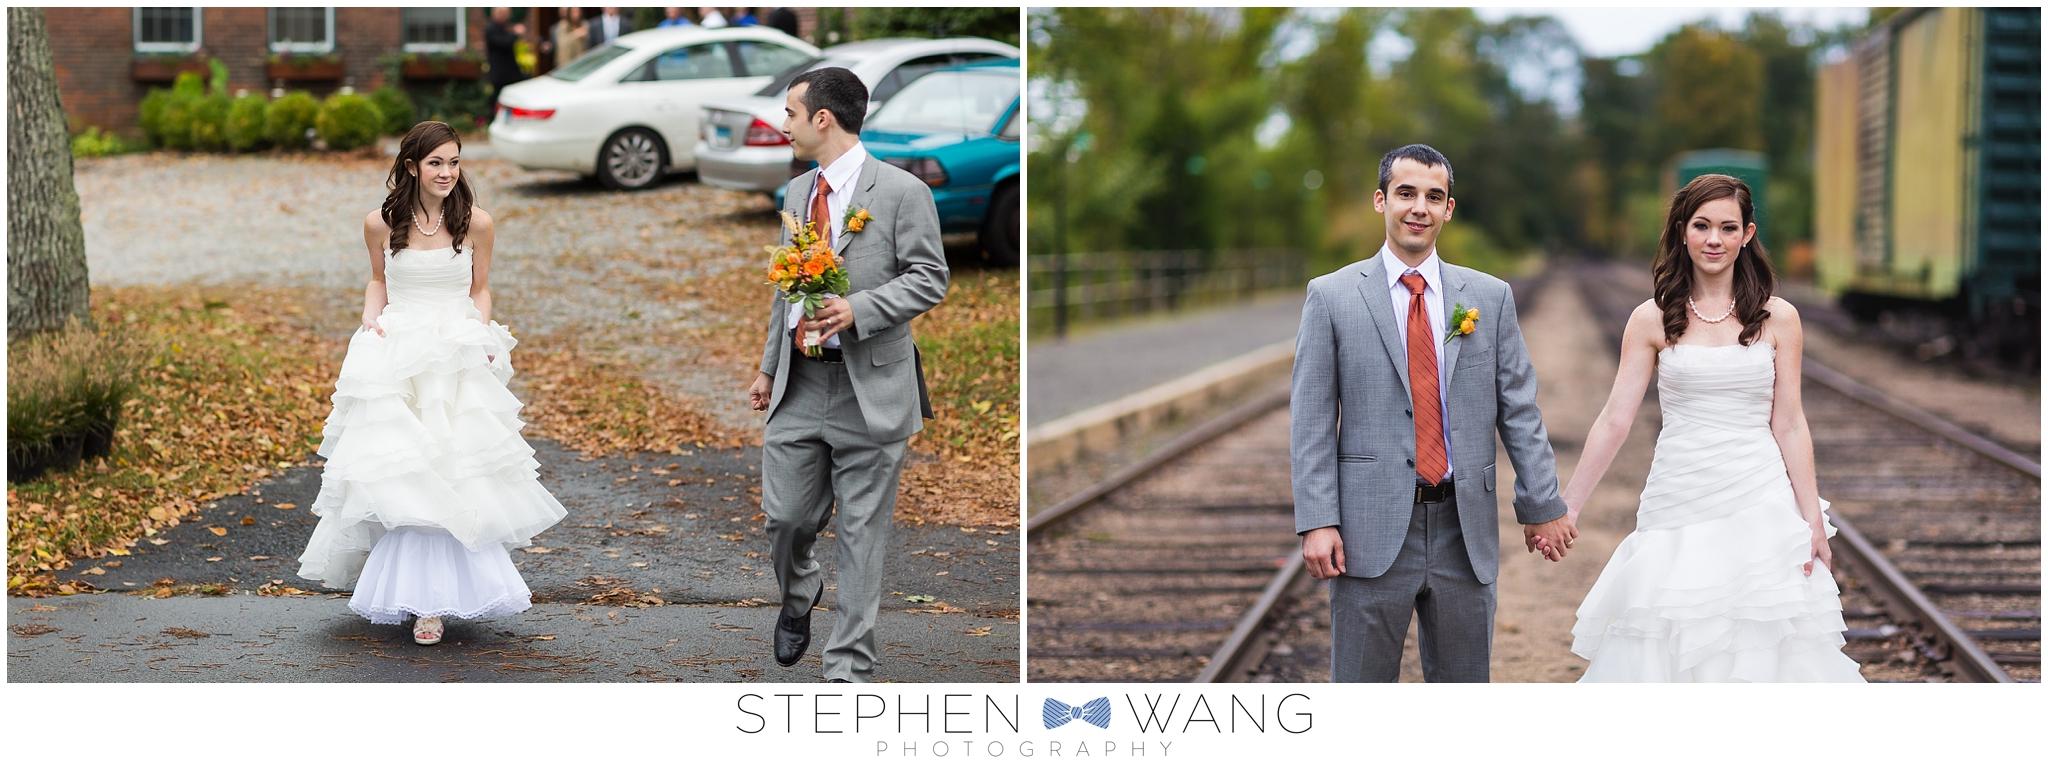 Stephen Wang Photography wedding connecticut deep river lace factory wedding photography connecticut photographer-01-22_0015.jpg